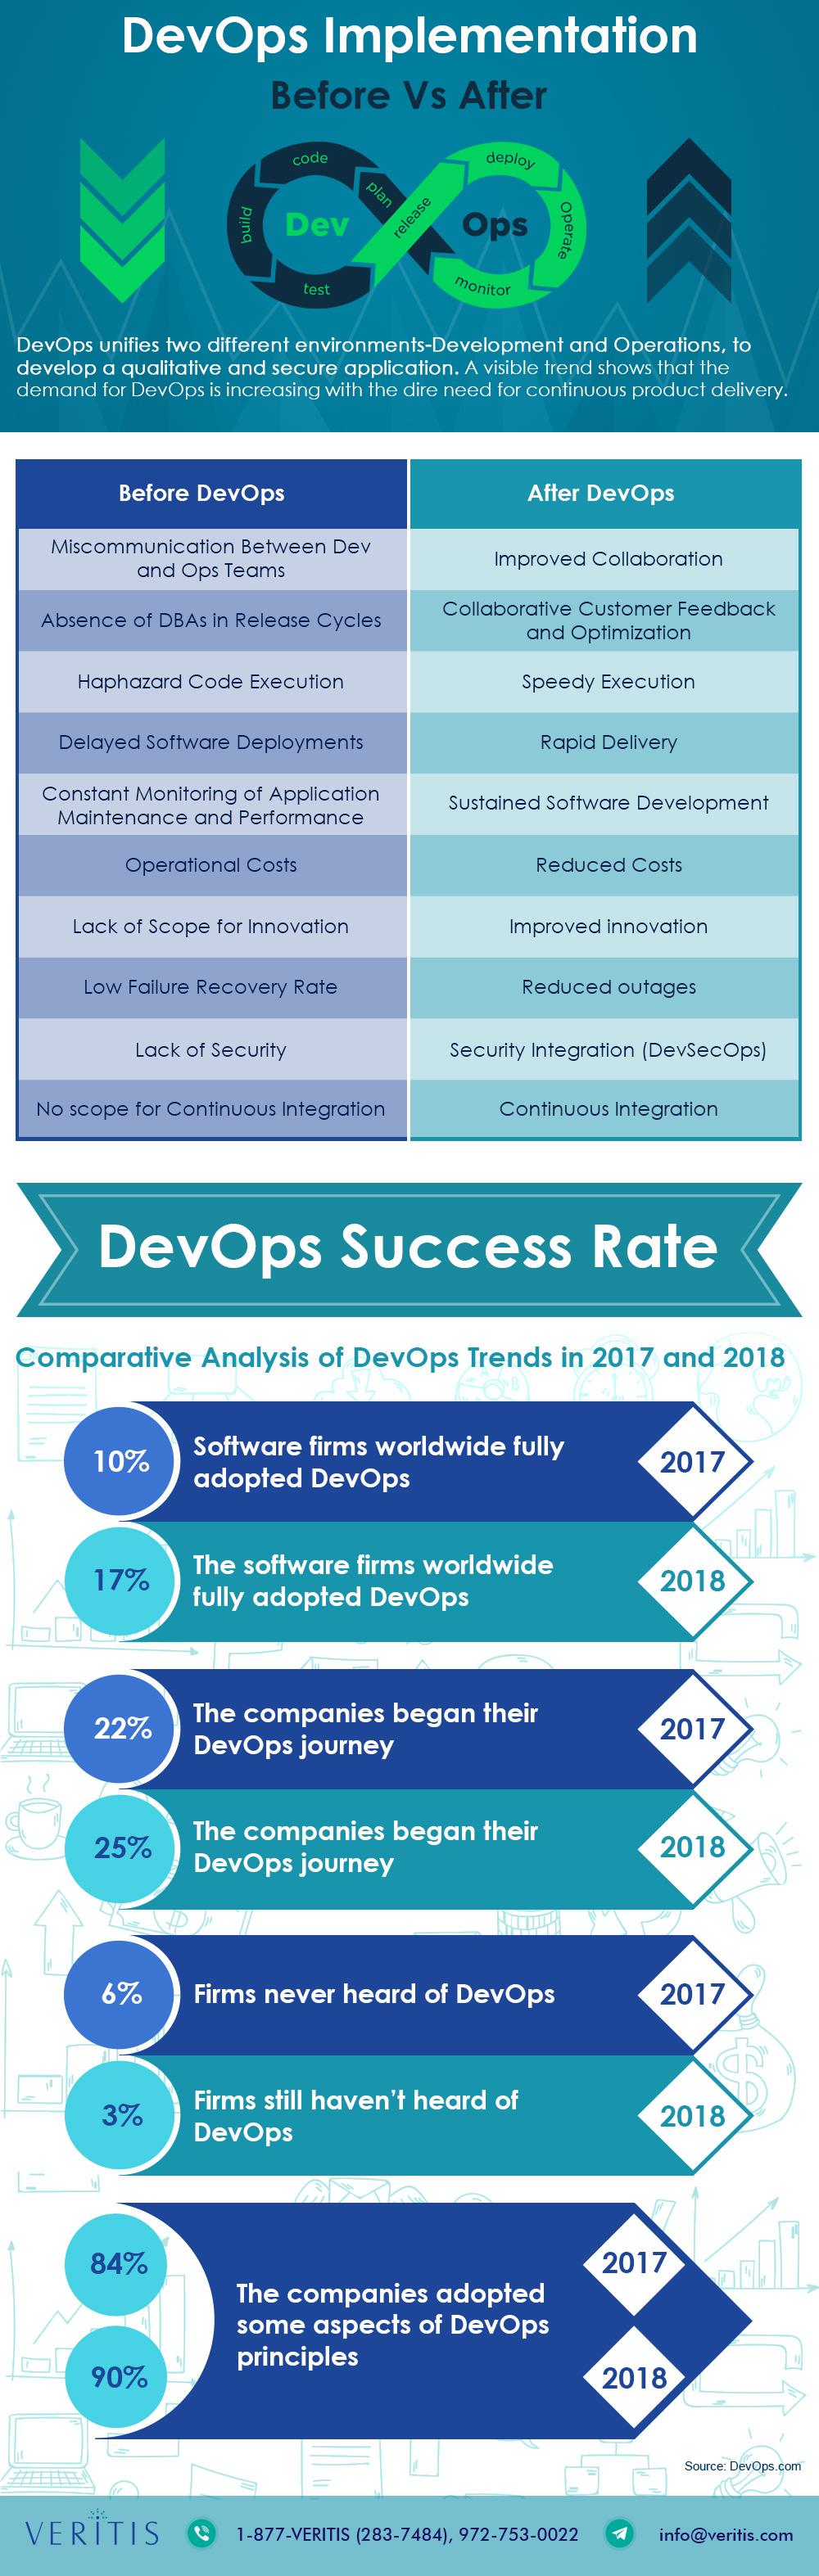 Devops Before and After Implementation